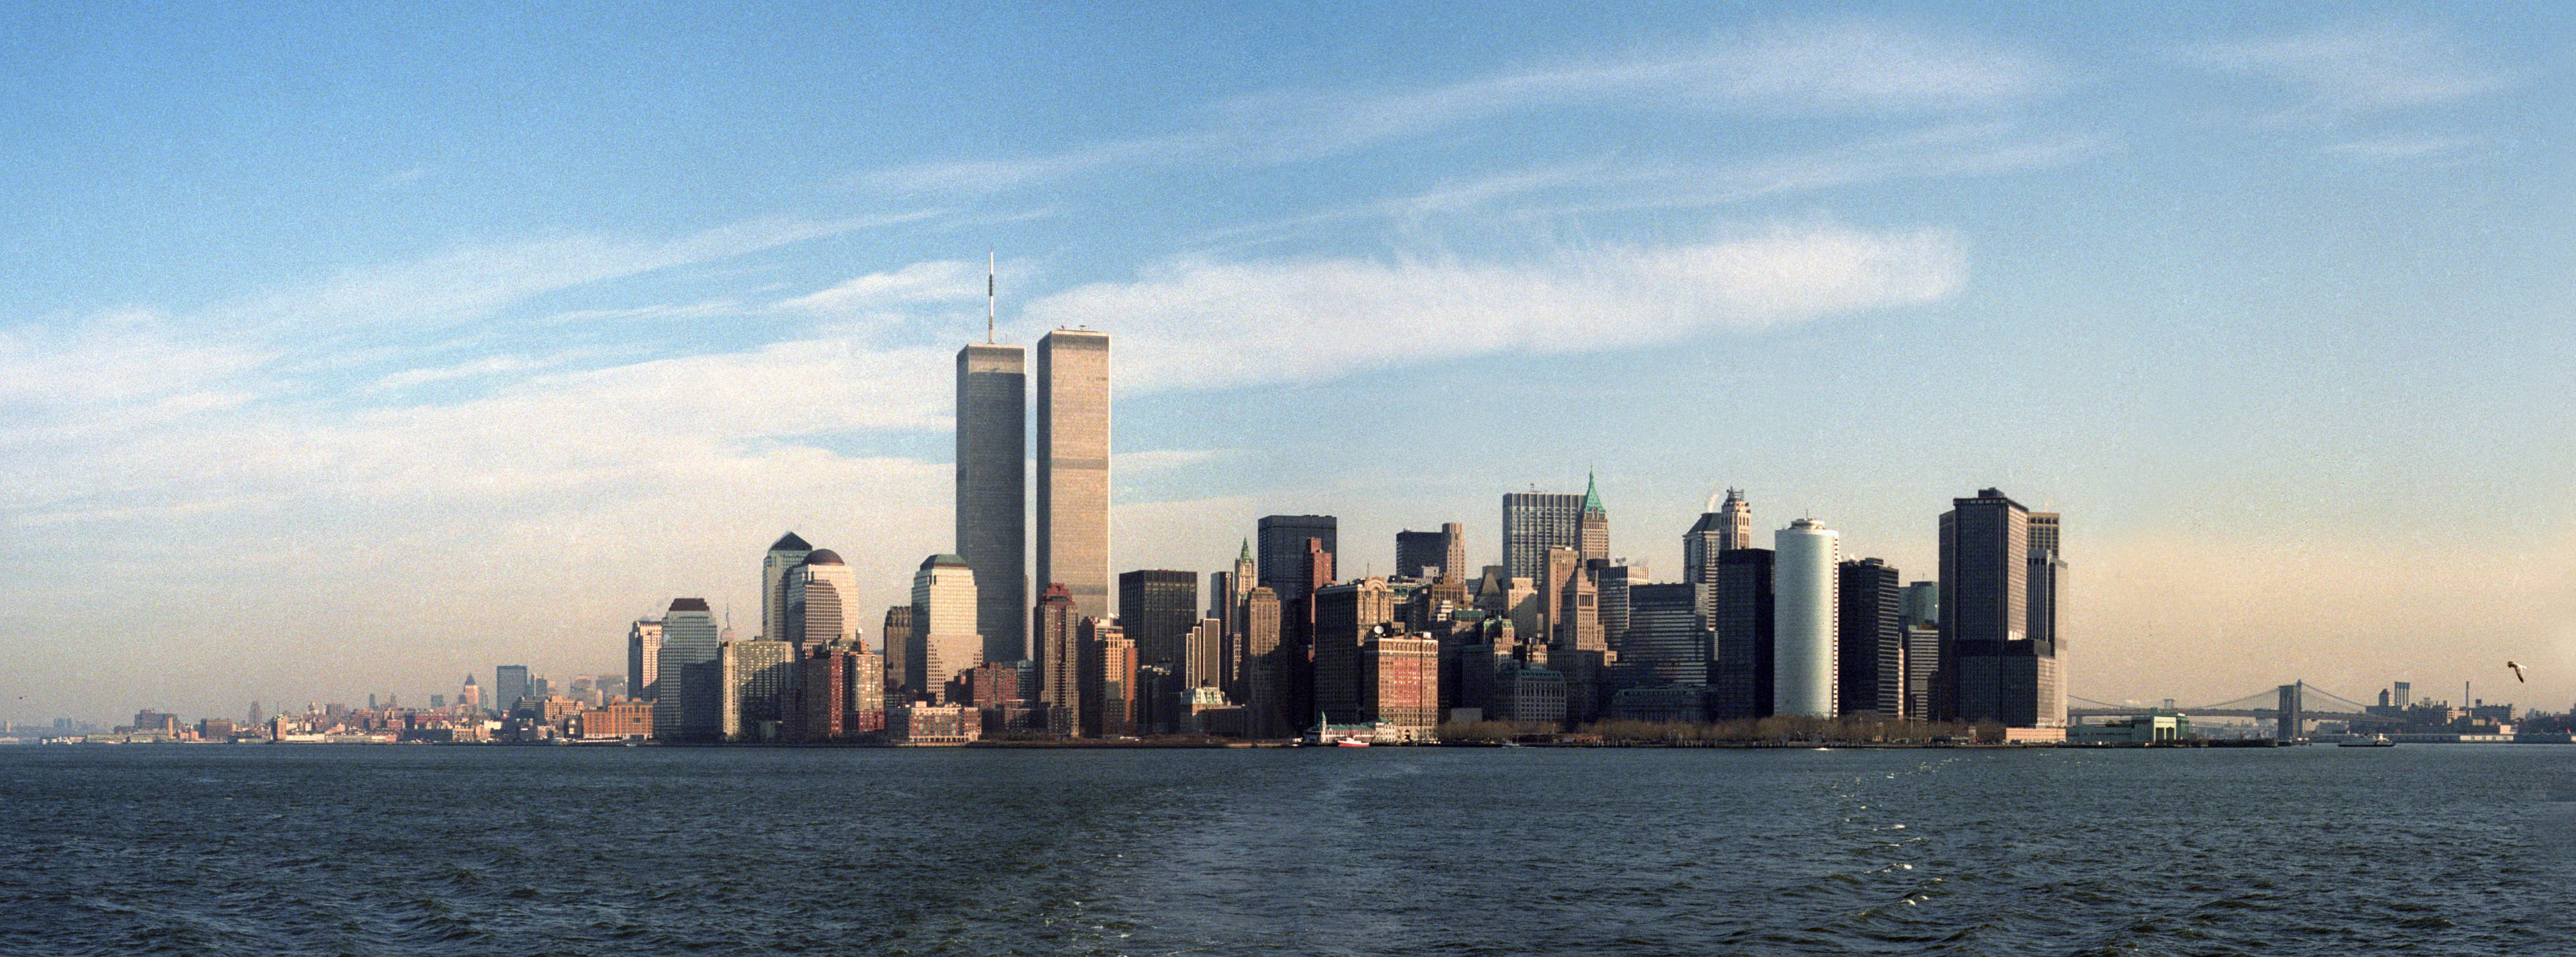 File:Lower Manhattan Skyline December 1991 3.jpg